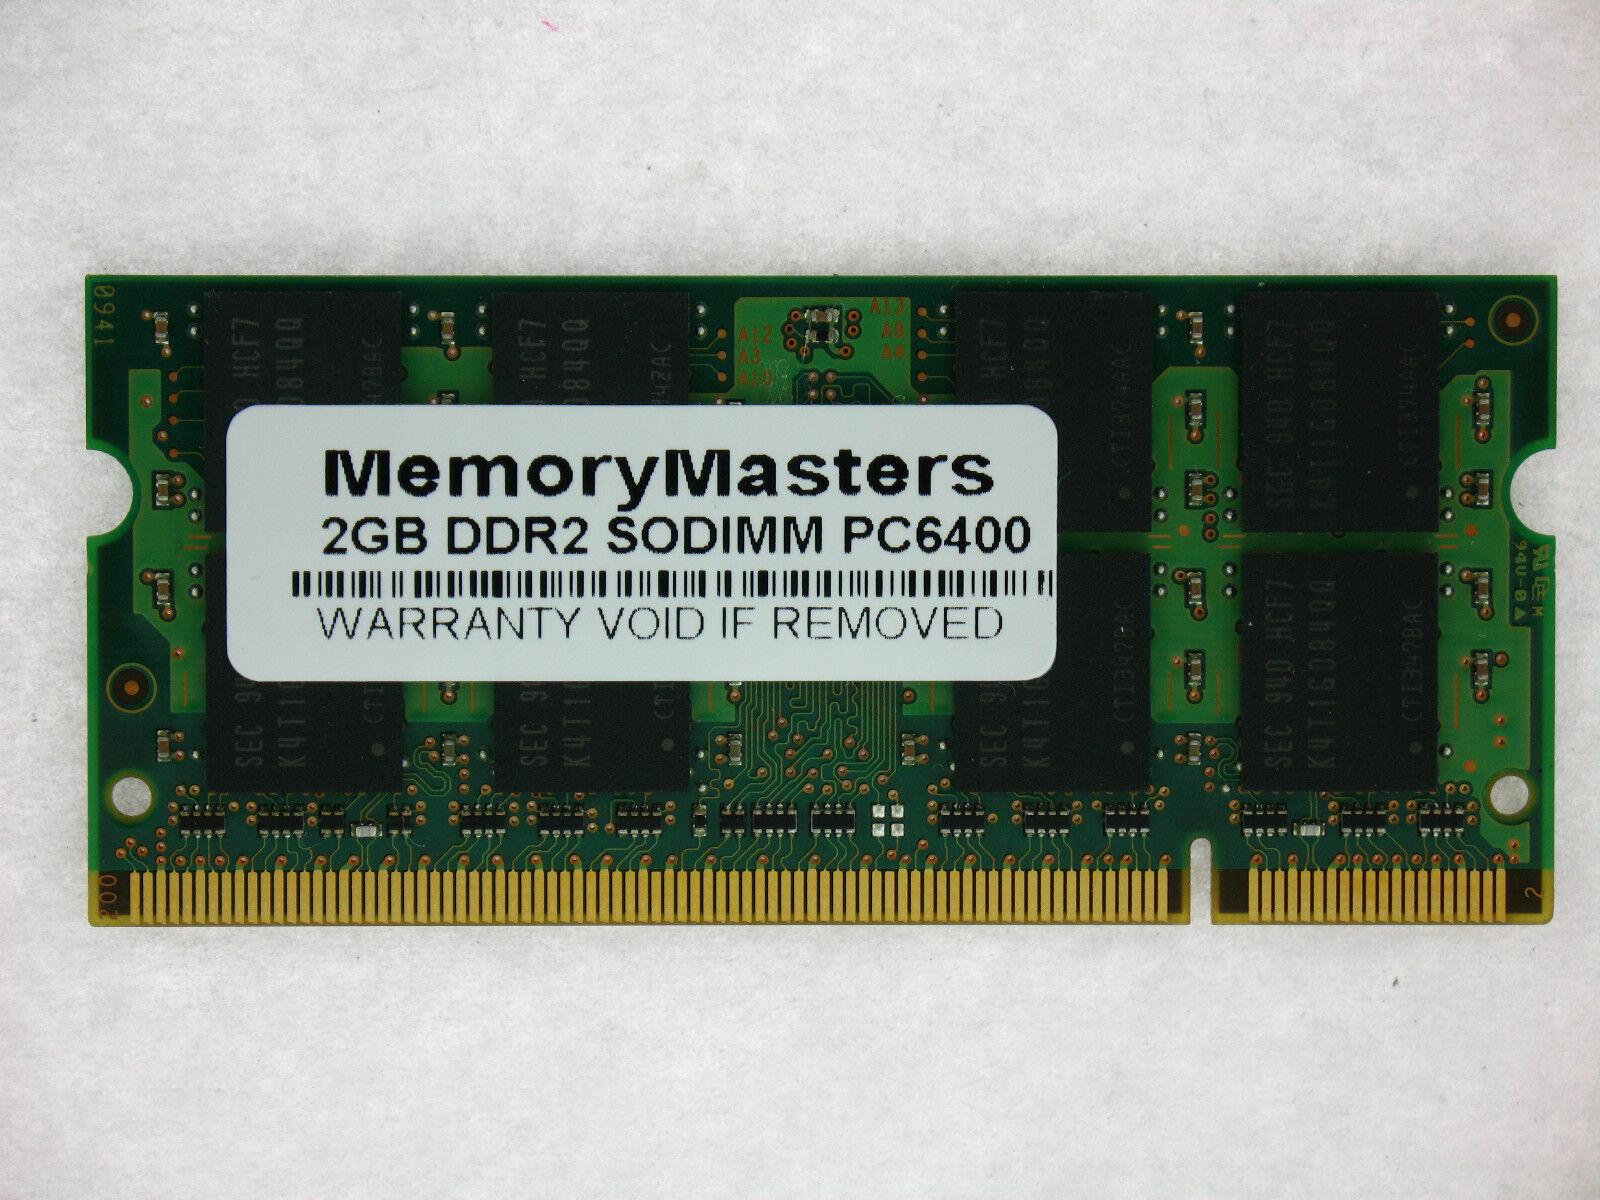 2GB COMPAT TO PA3376U-1M2G PA3676U-1M2G PA3856U-1M2G